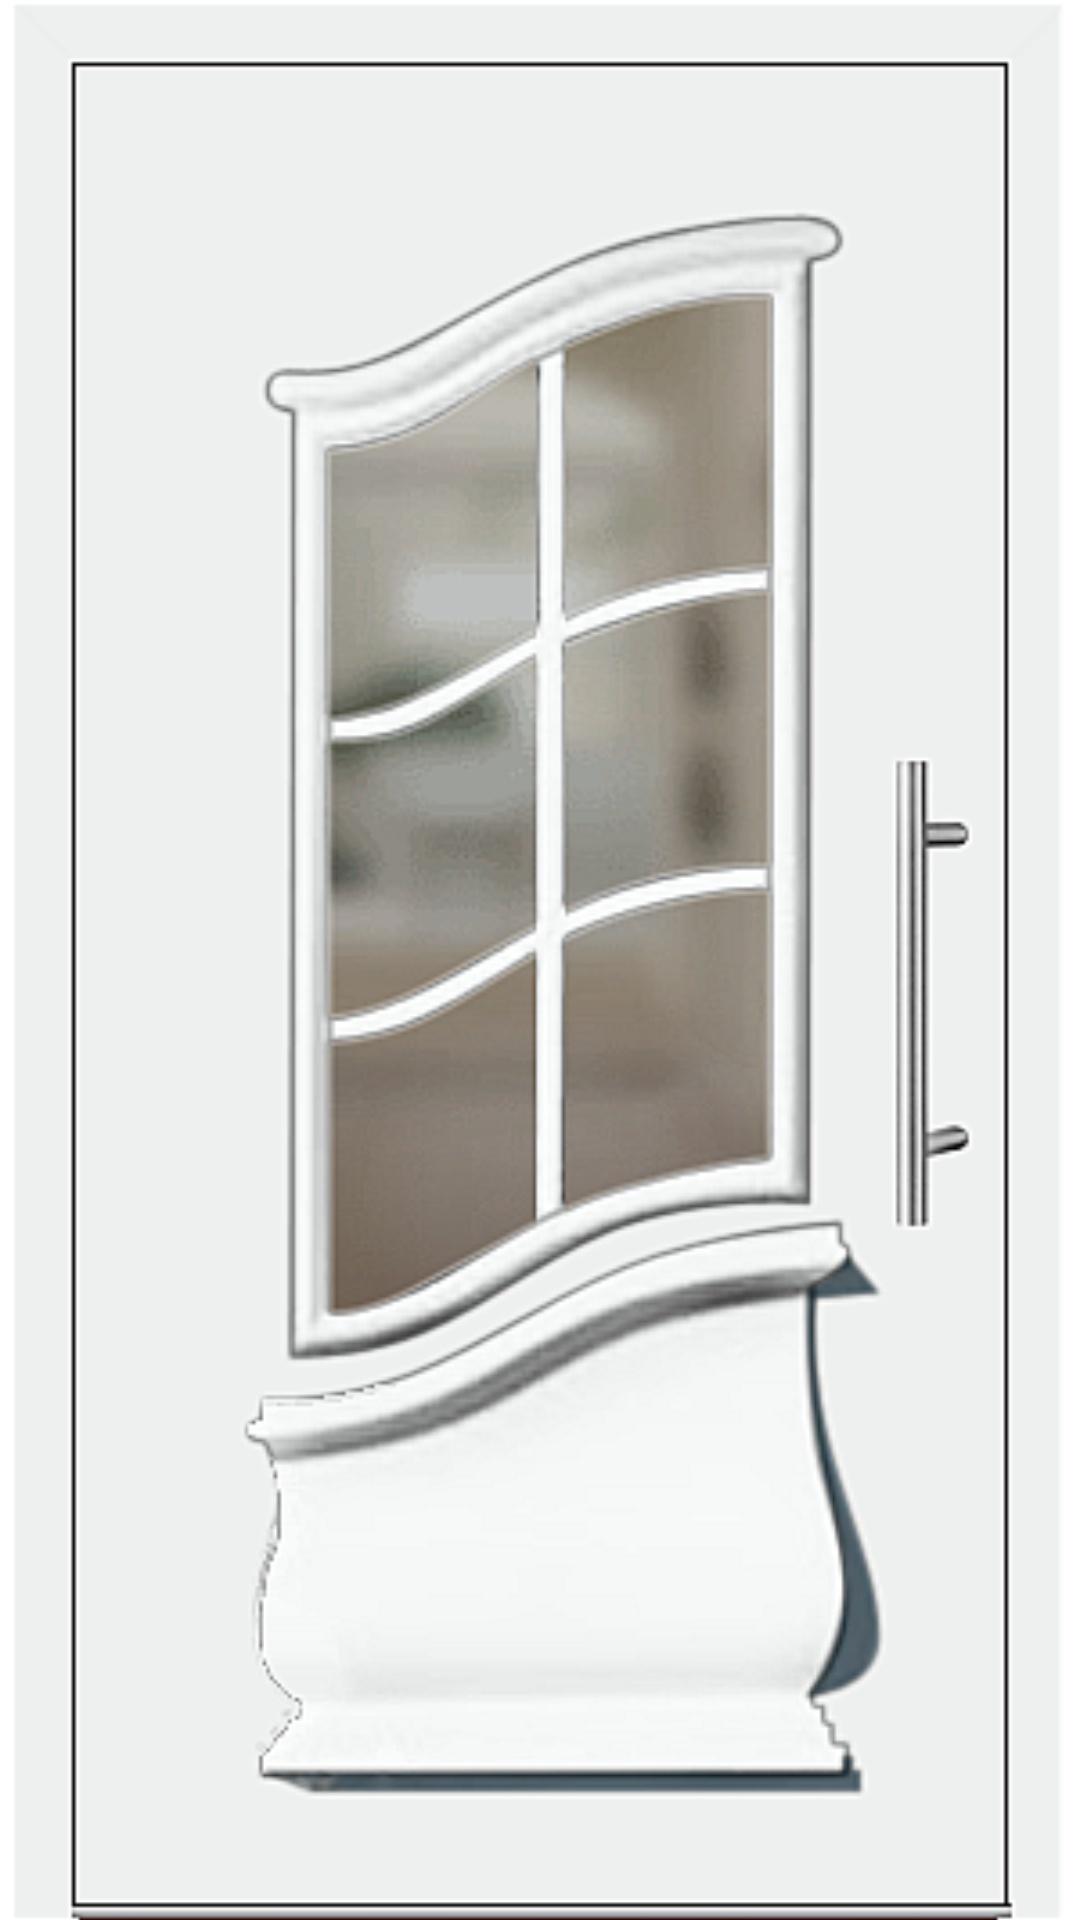 Aluminium Haustür Modell 6453-15 weiß